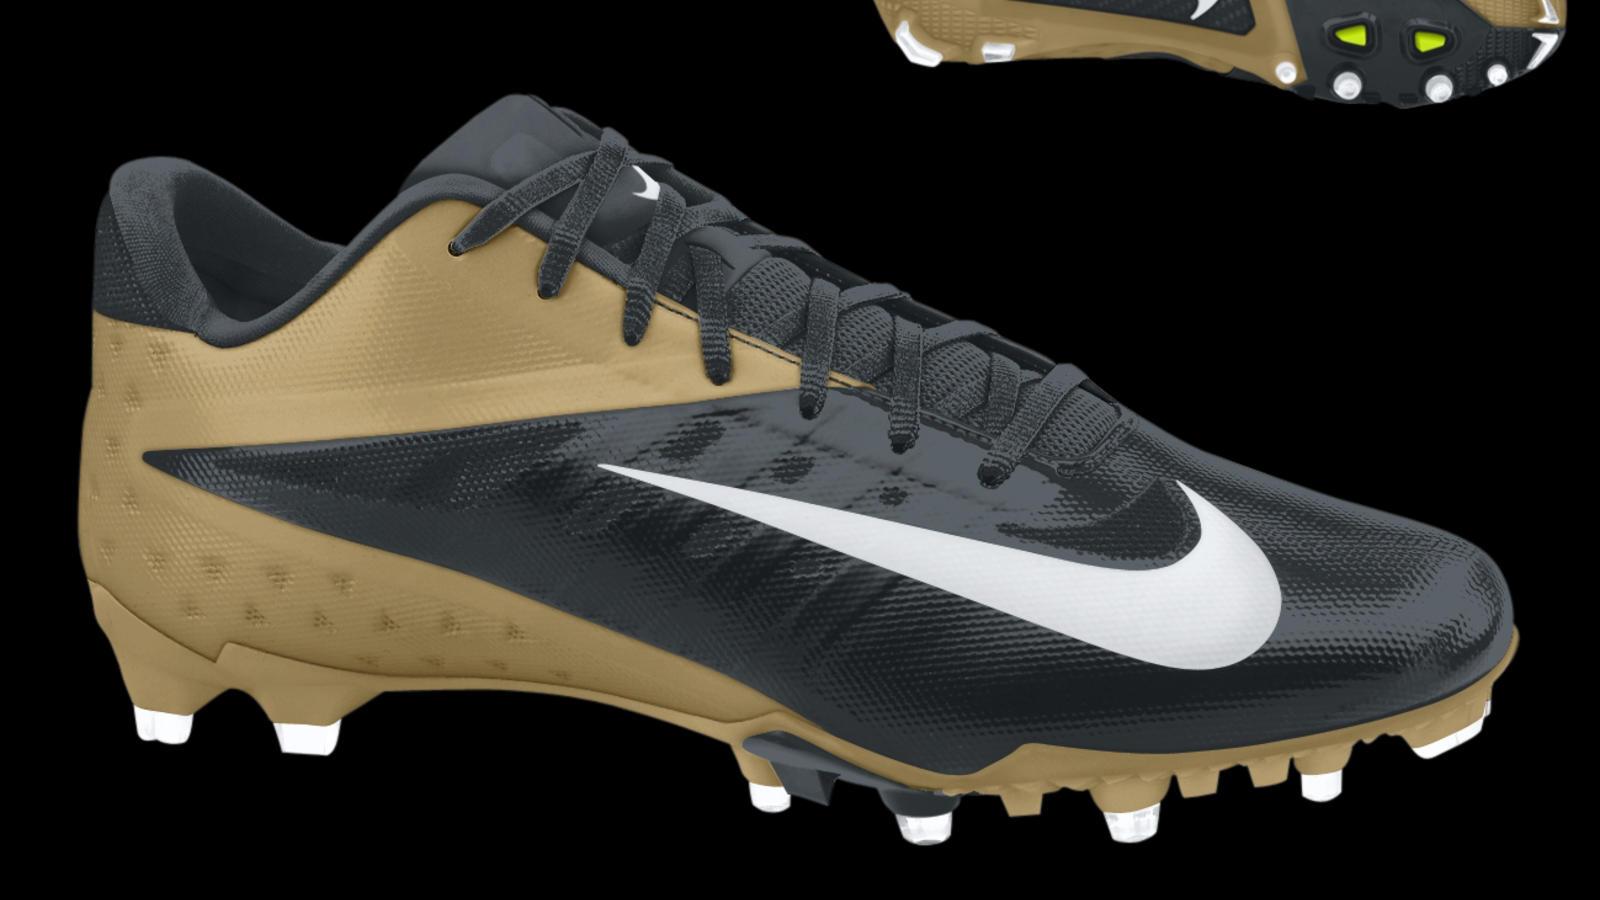 New Orleans Saints 2012 Nike Football